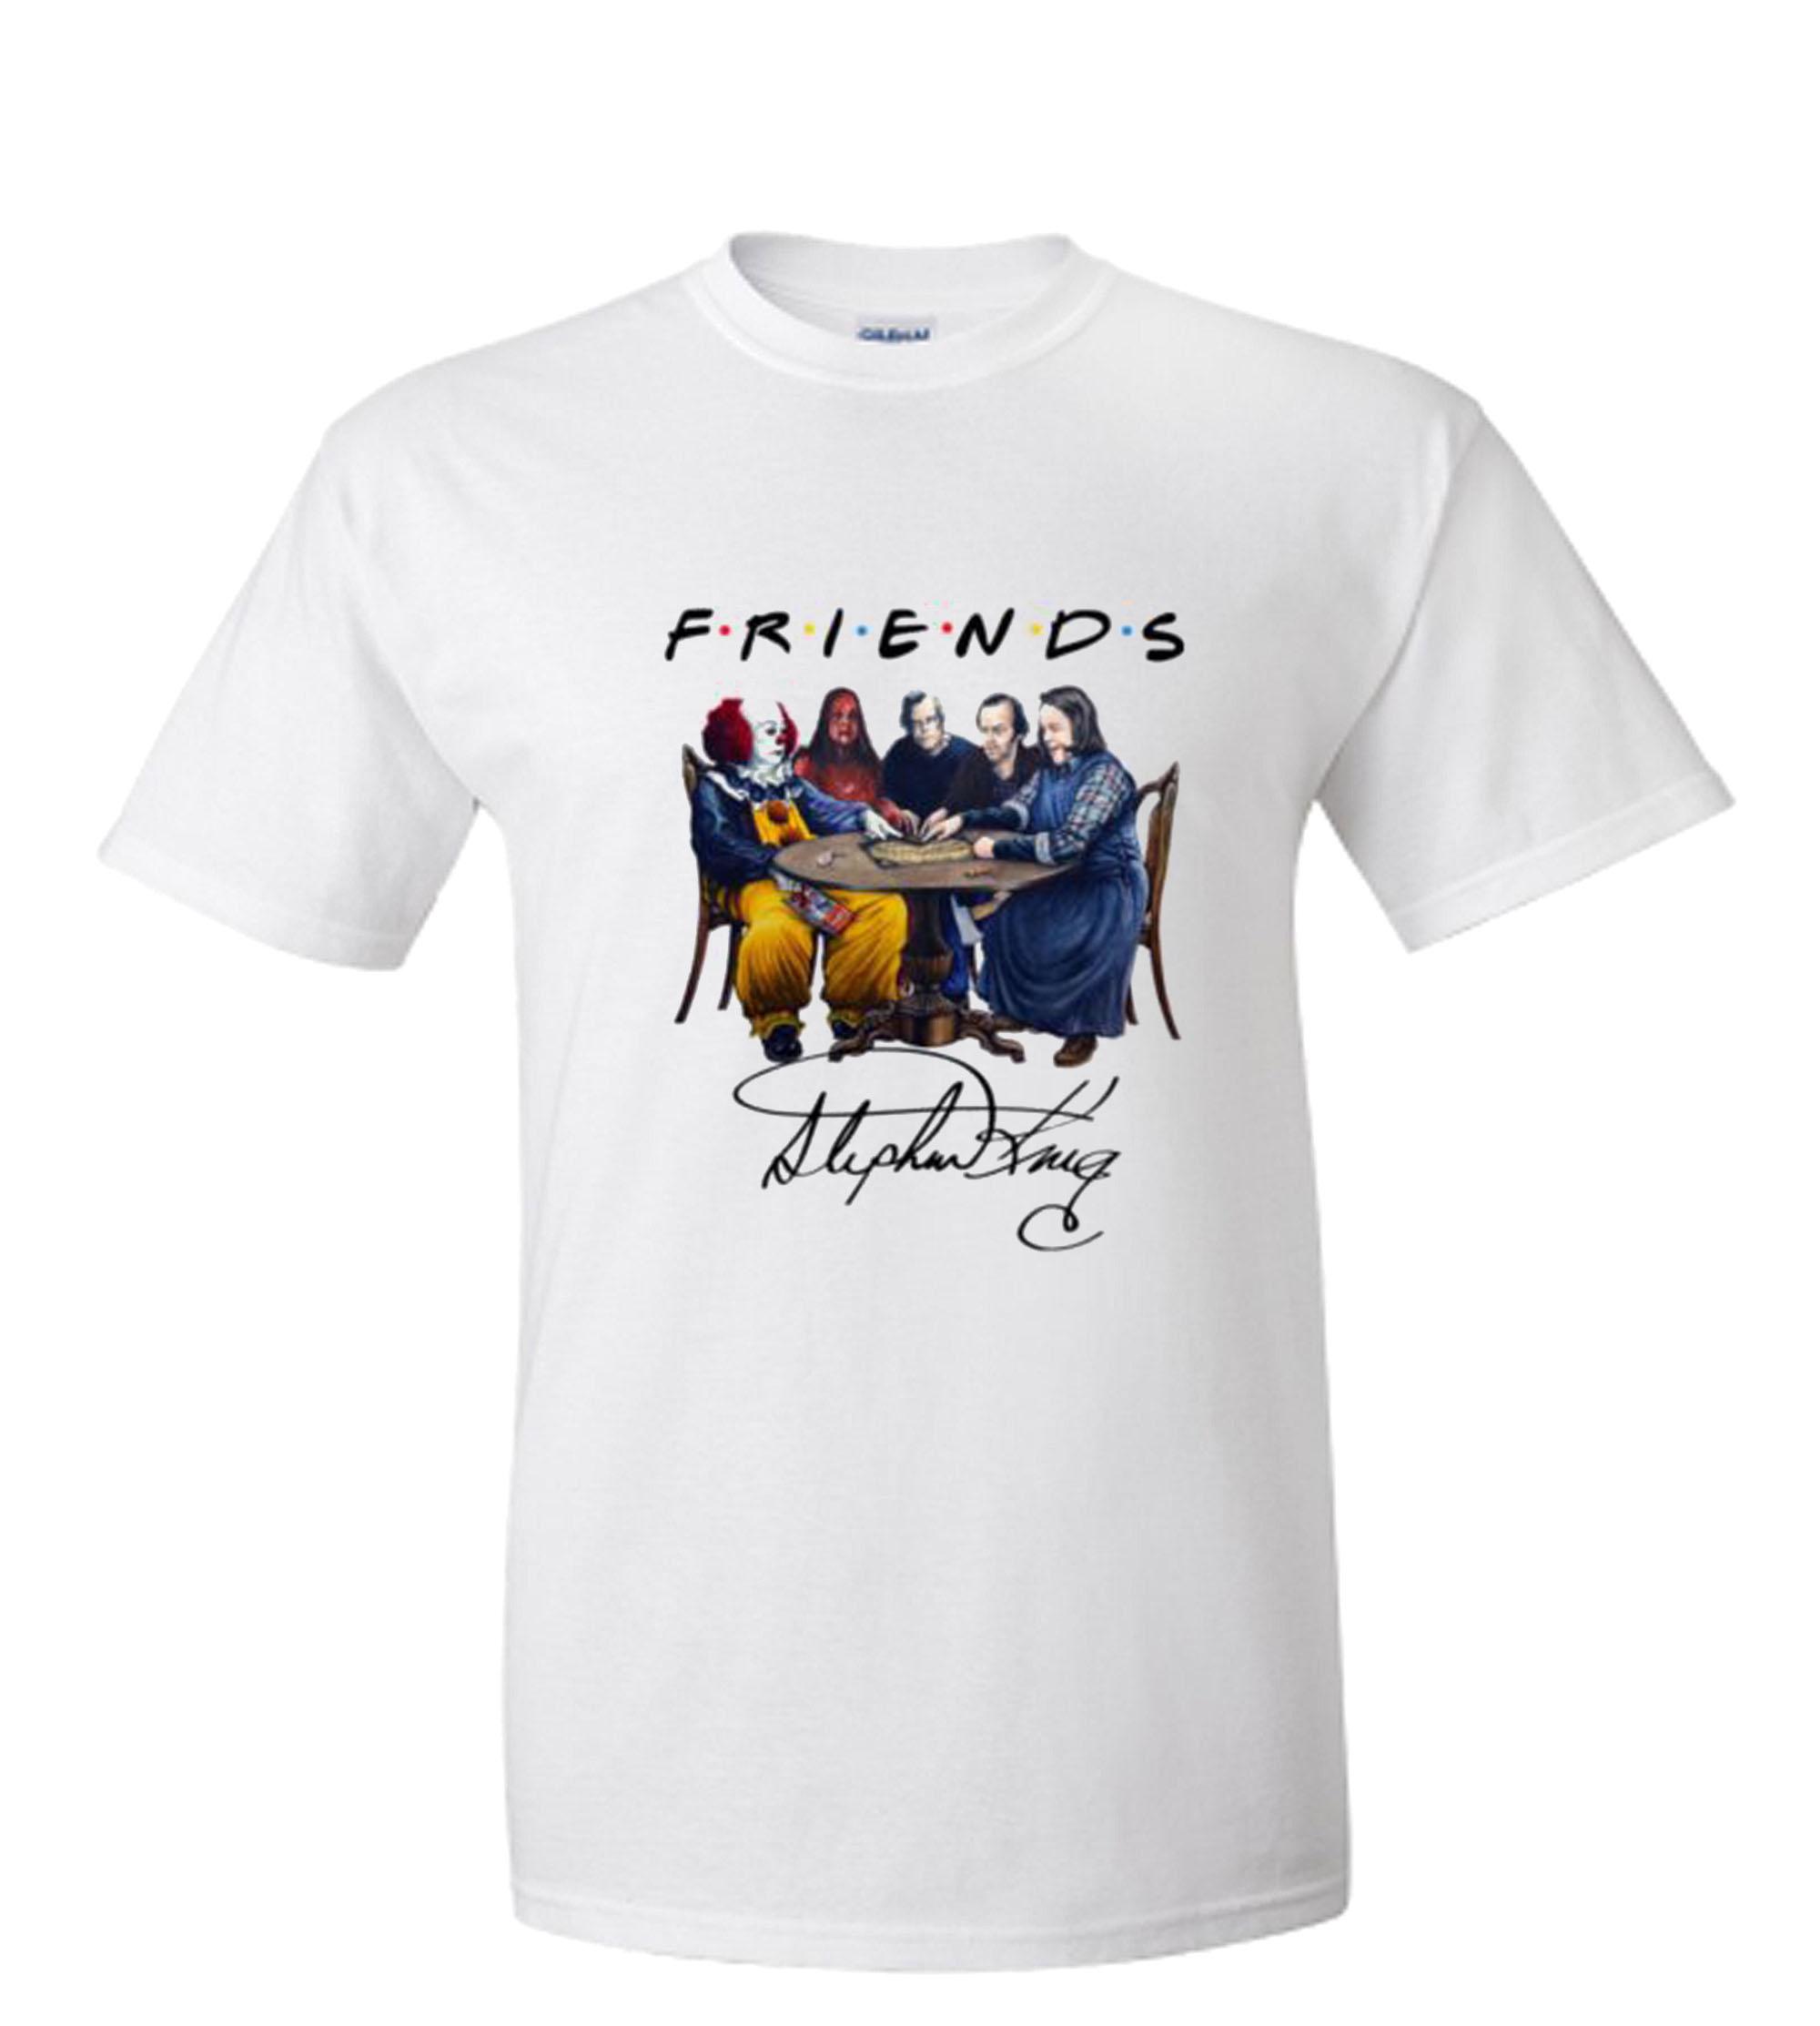 Stephen King Horror Friends RS T Shirt